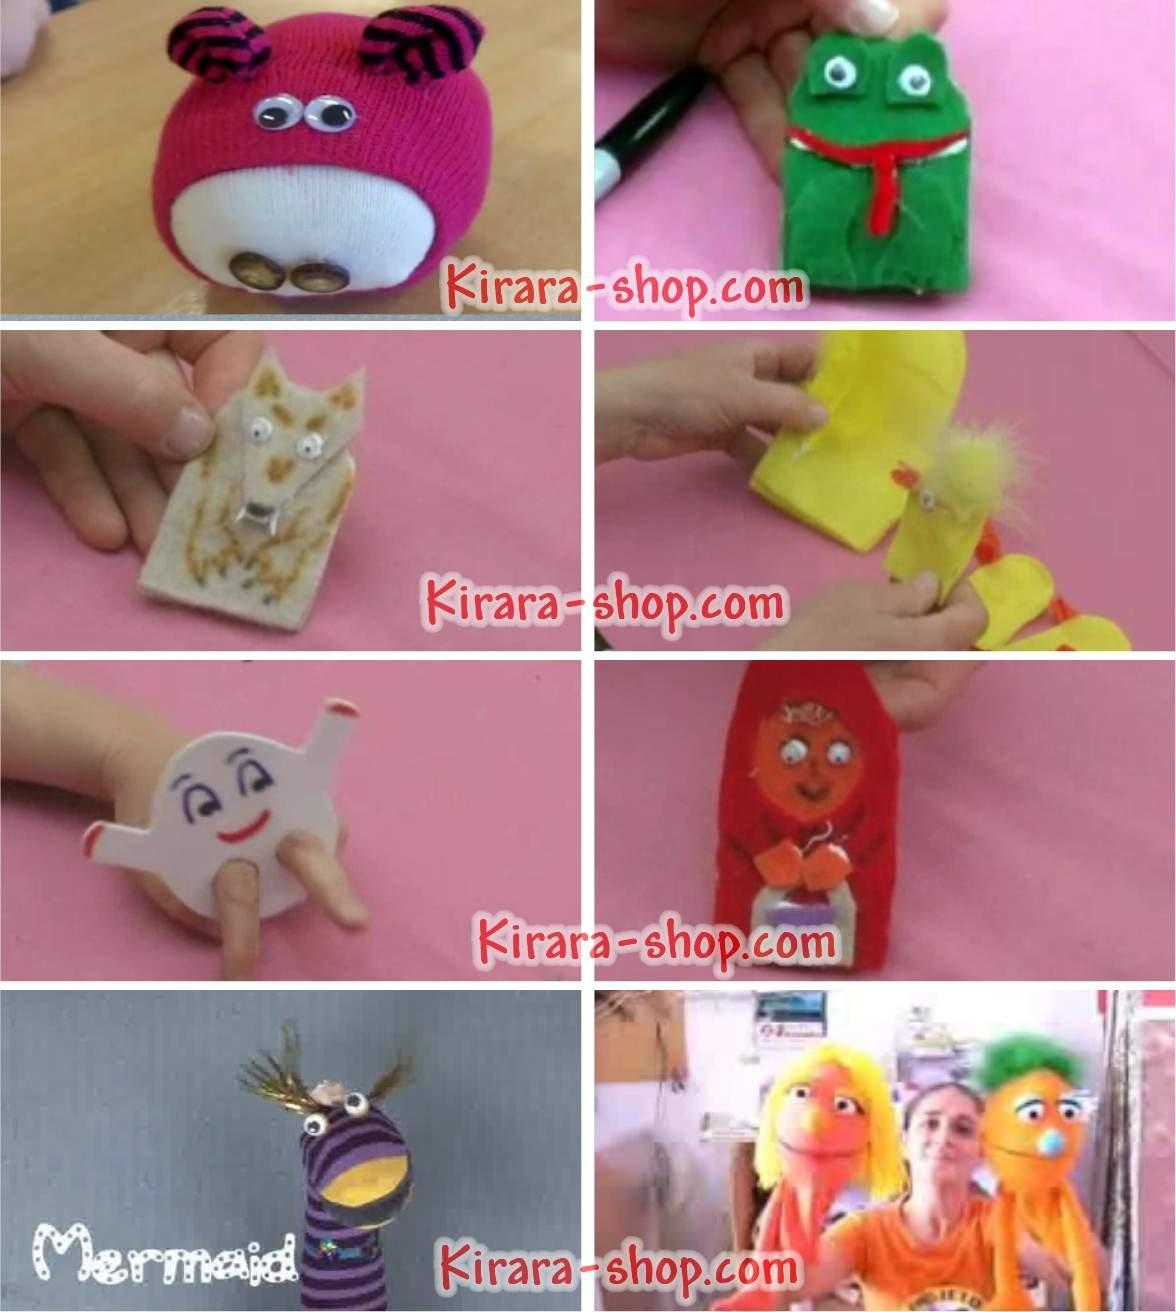 ... boneka+kaos+kaki,+boneka+bicara,+mainan+anak,+cara+membuat+boneka.jpg